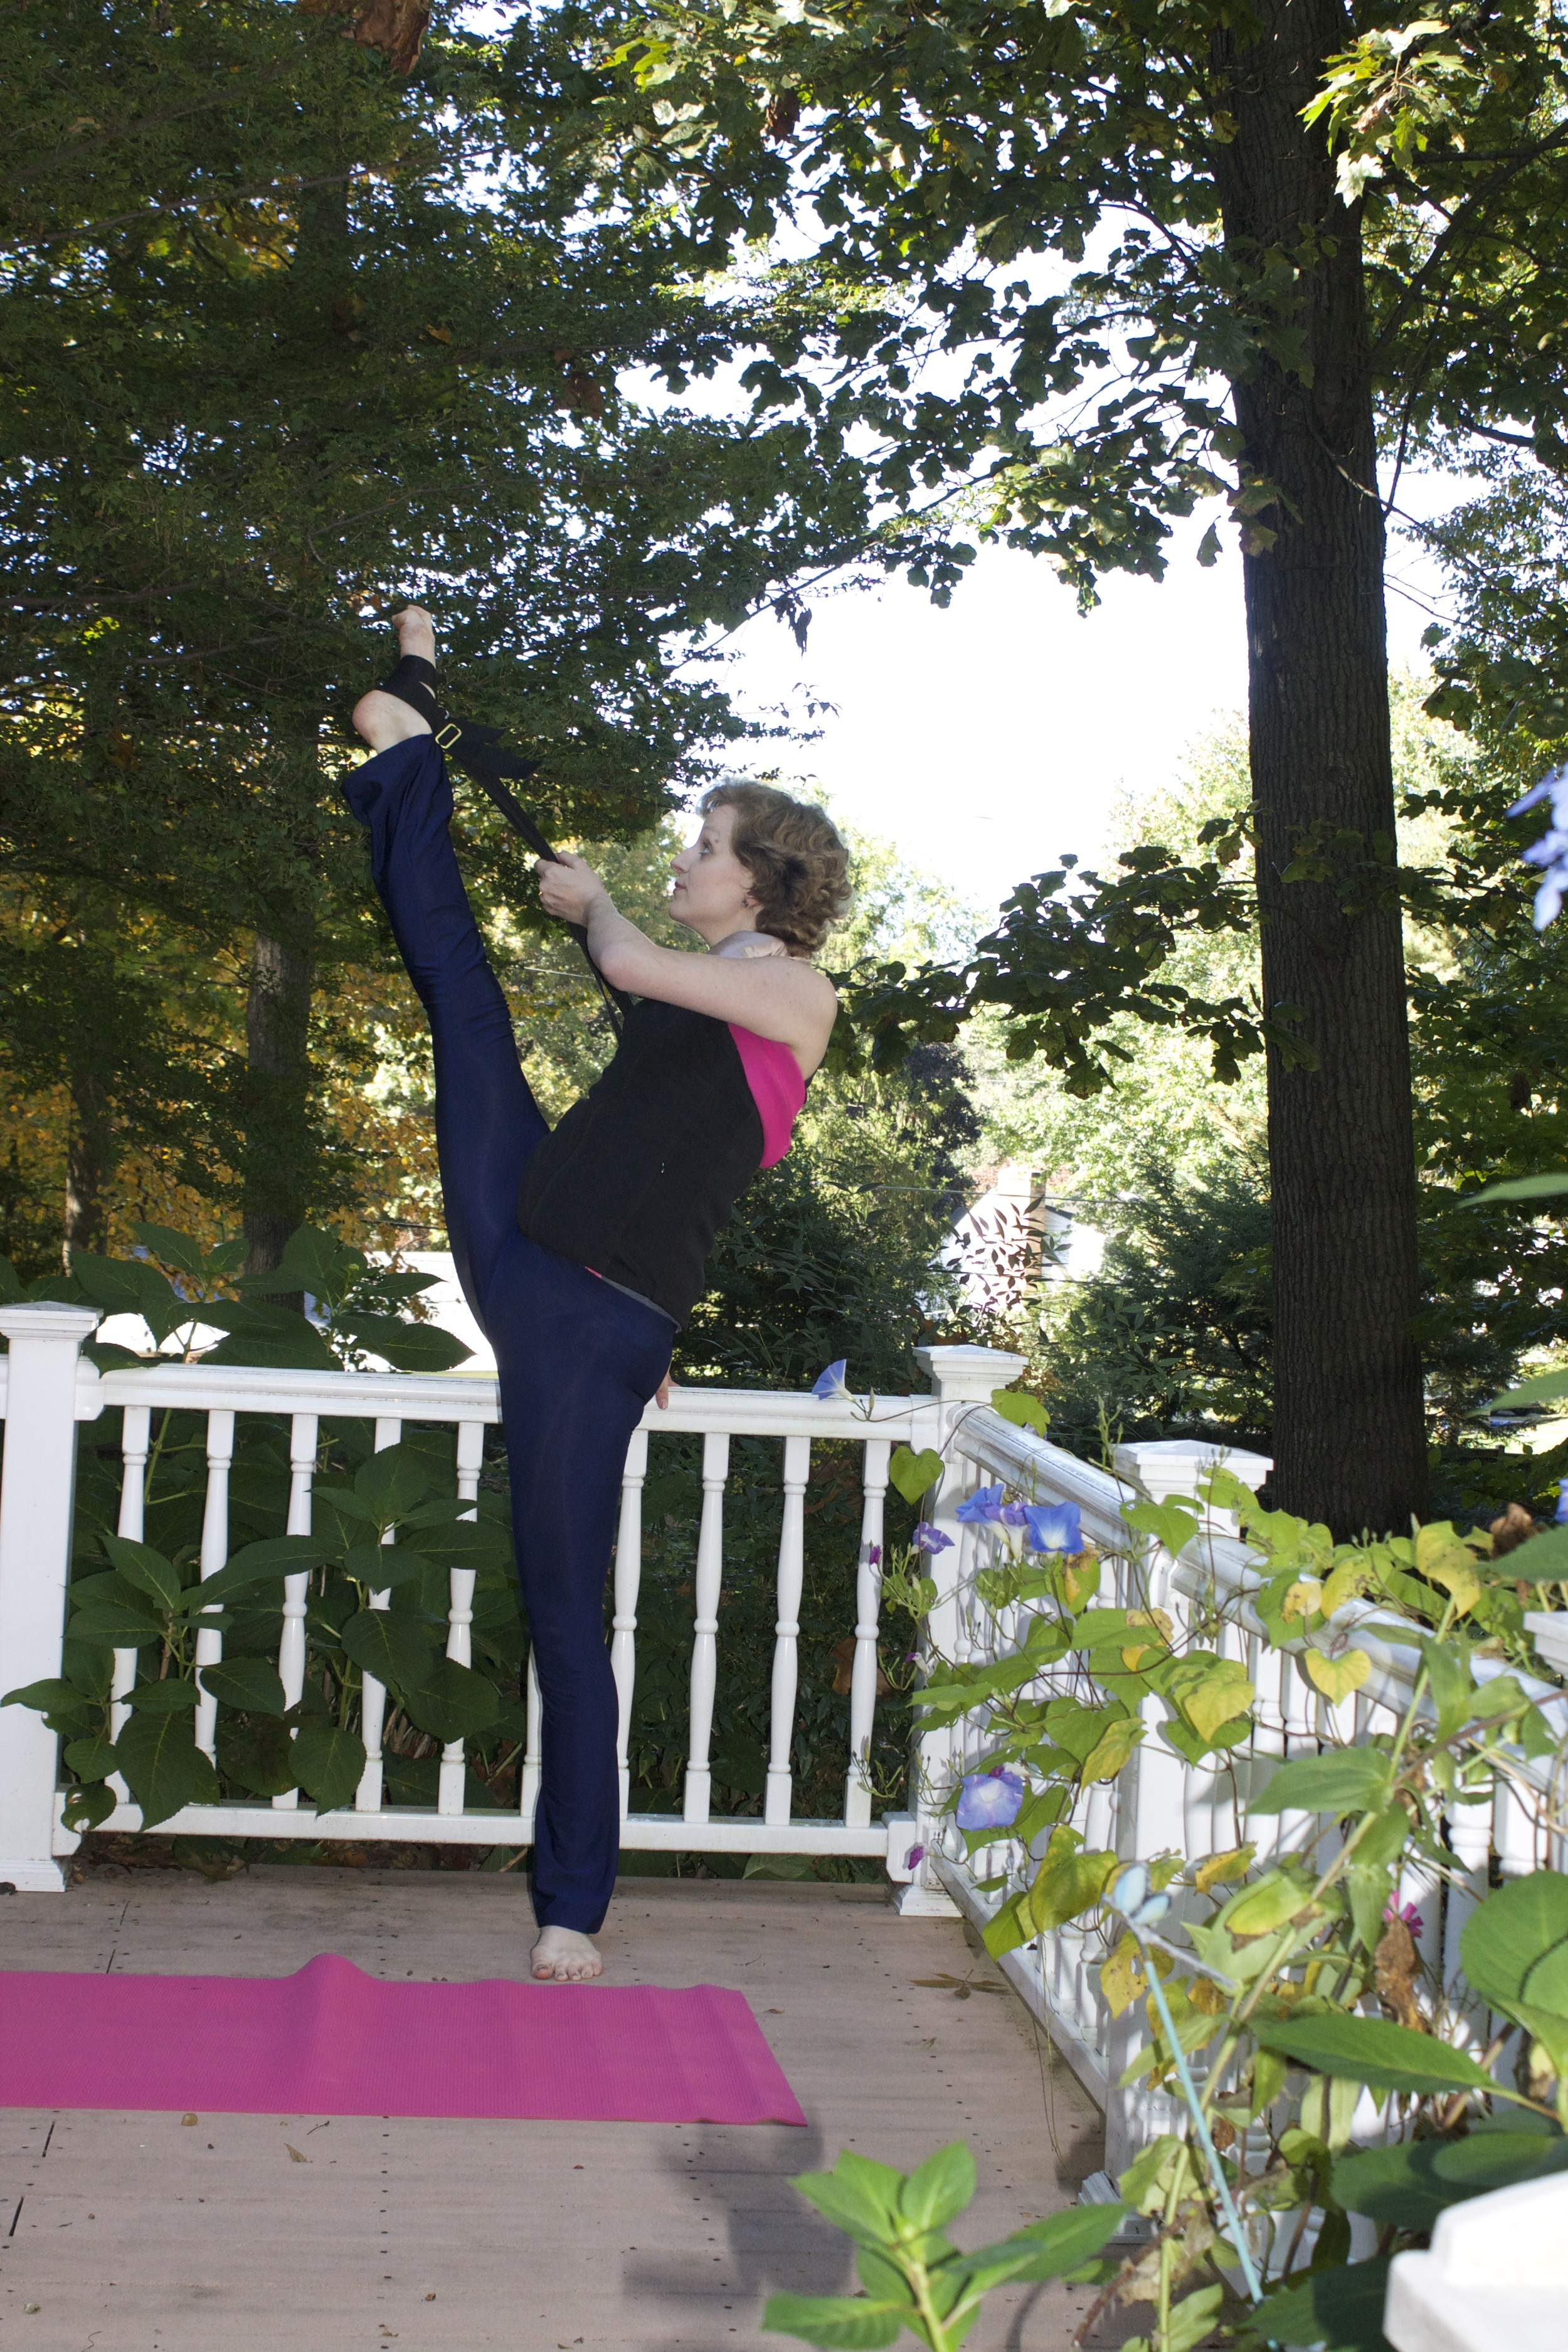 baldballerina